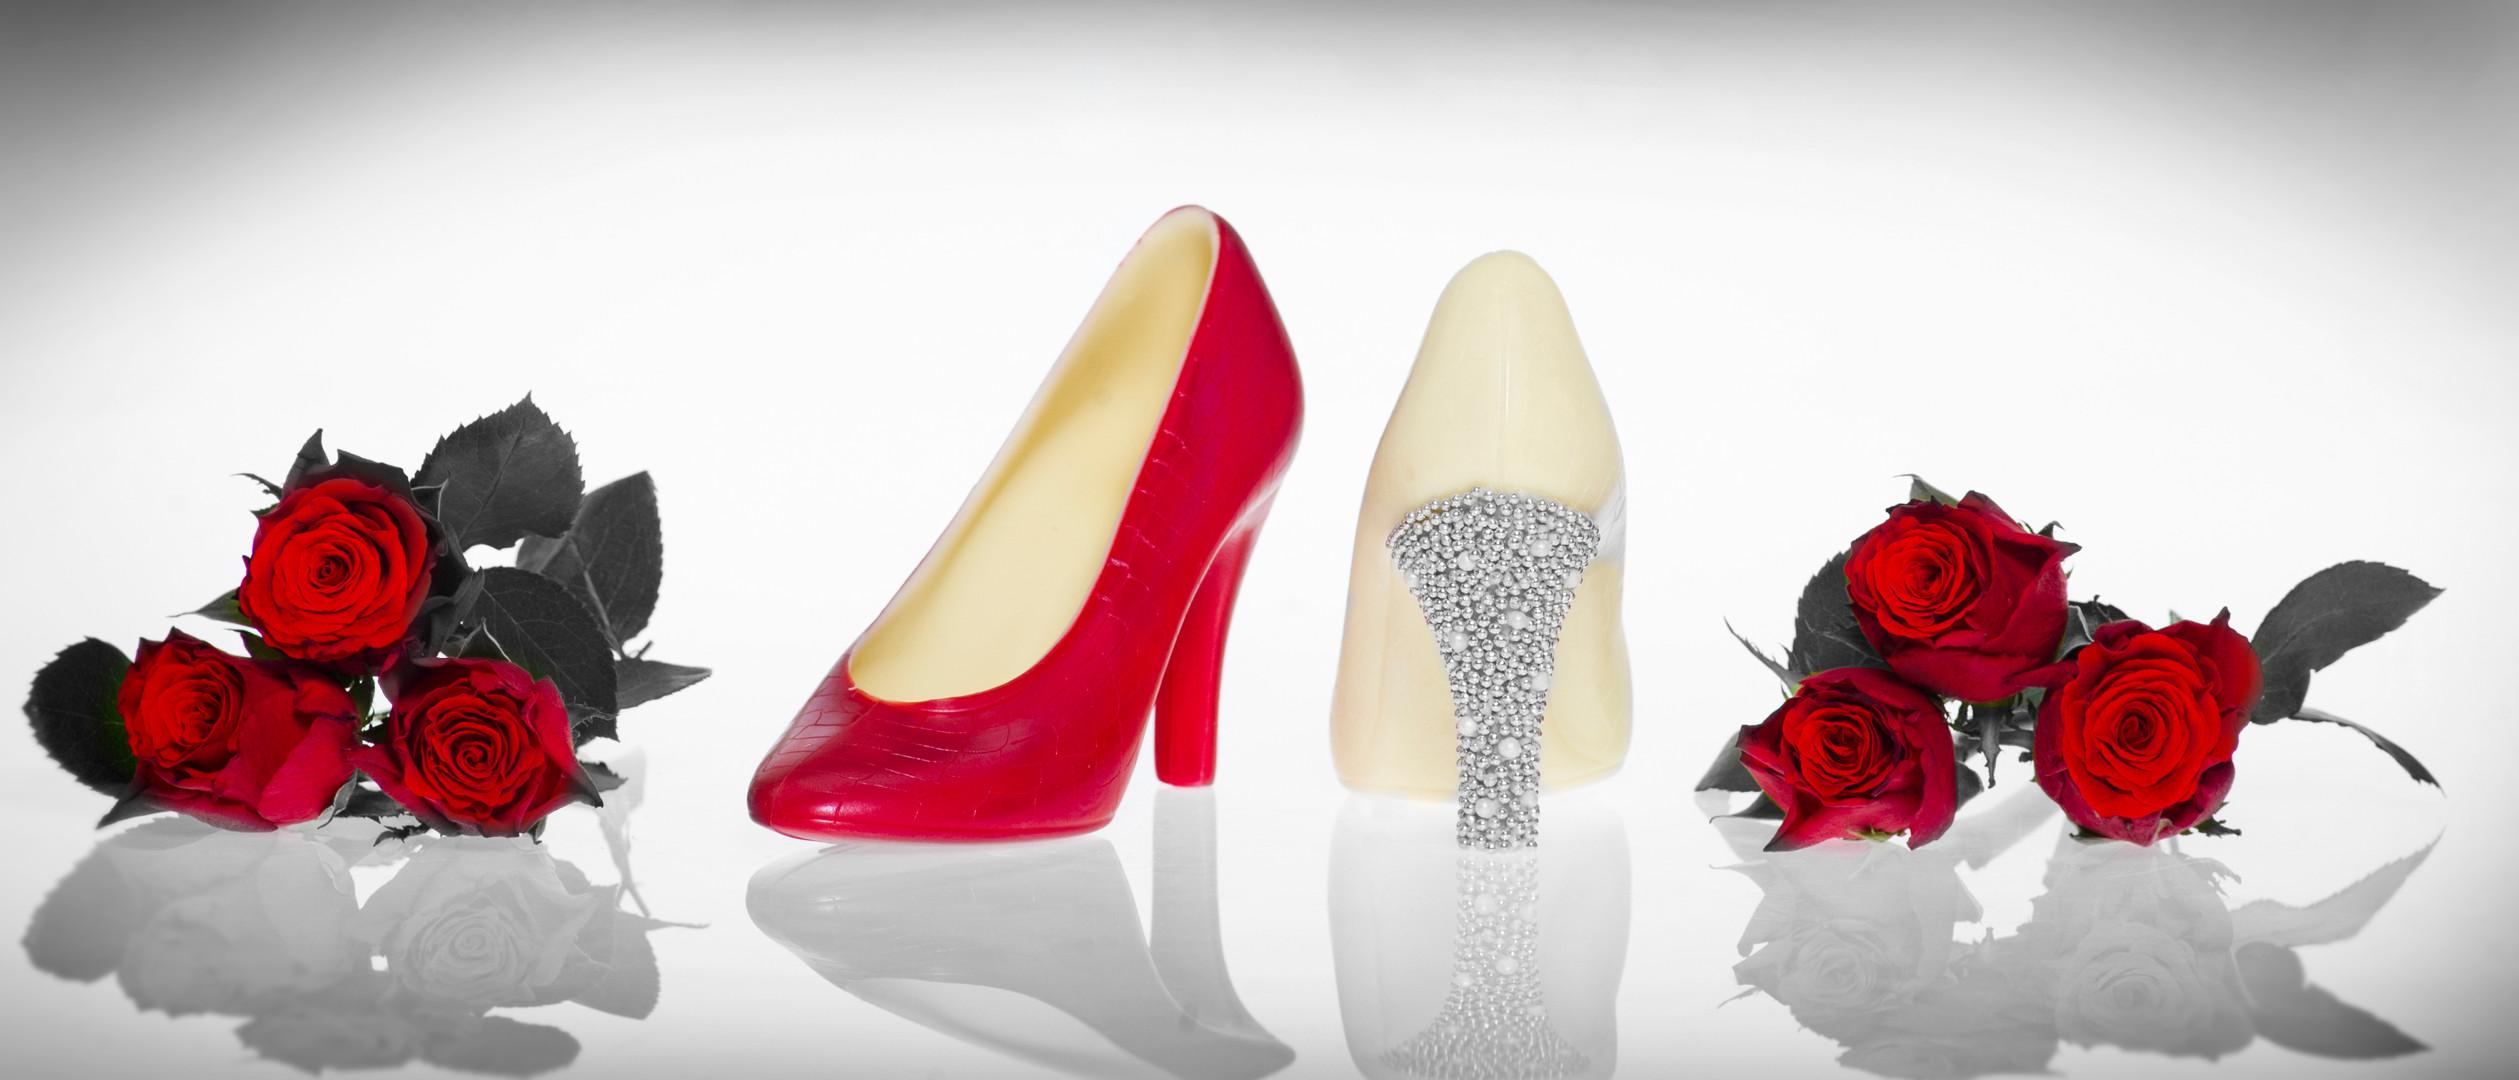 Azra Chocolate Shoes Studio Photography by Sirastudio. Photographers in Harrogate.